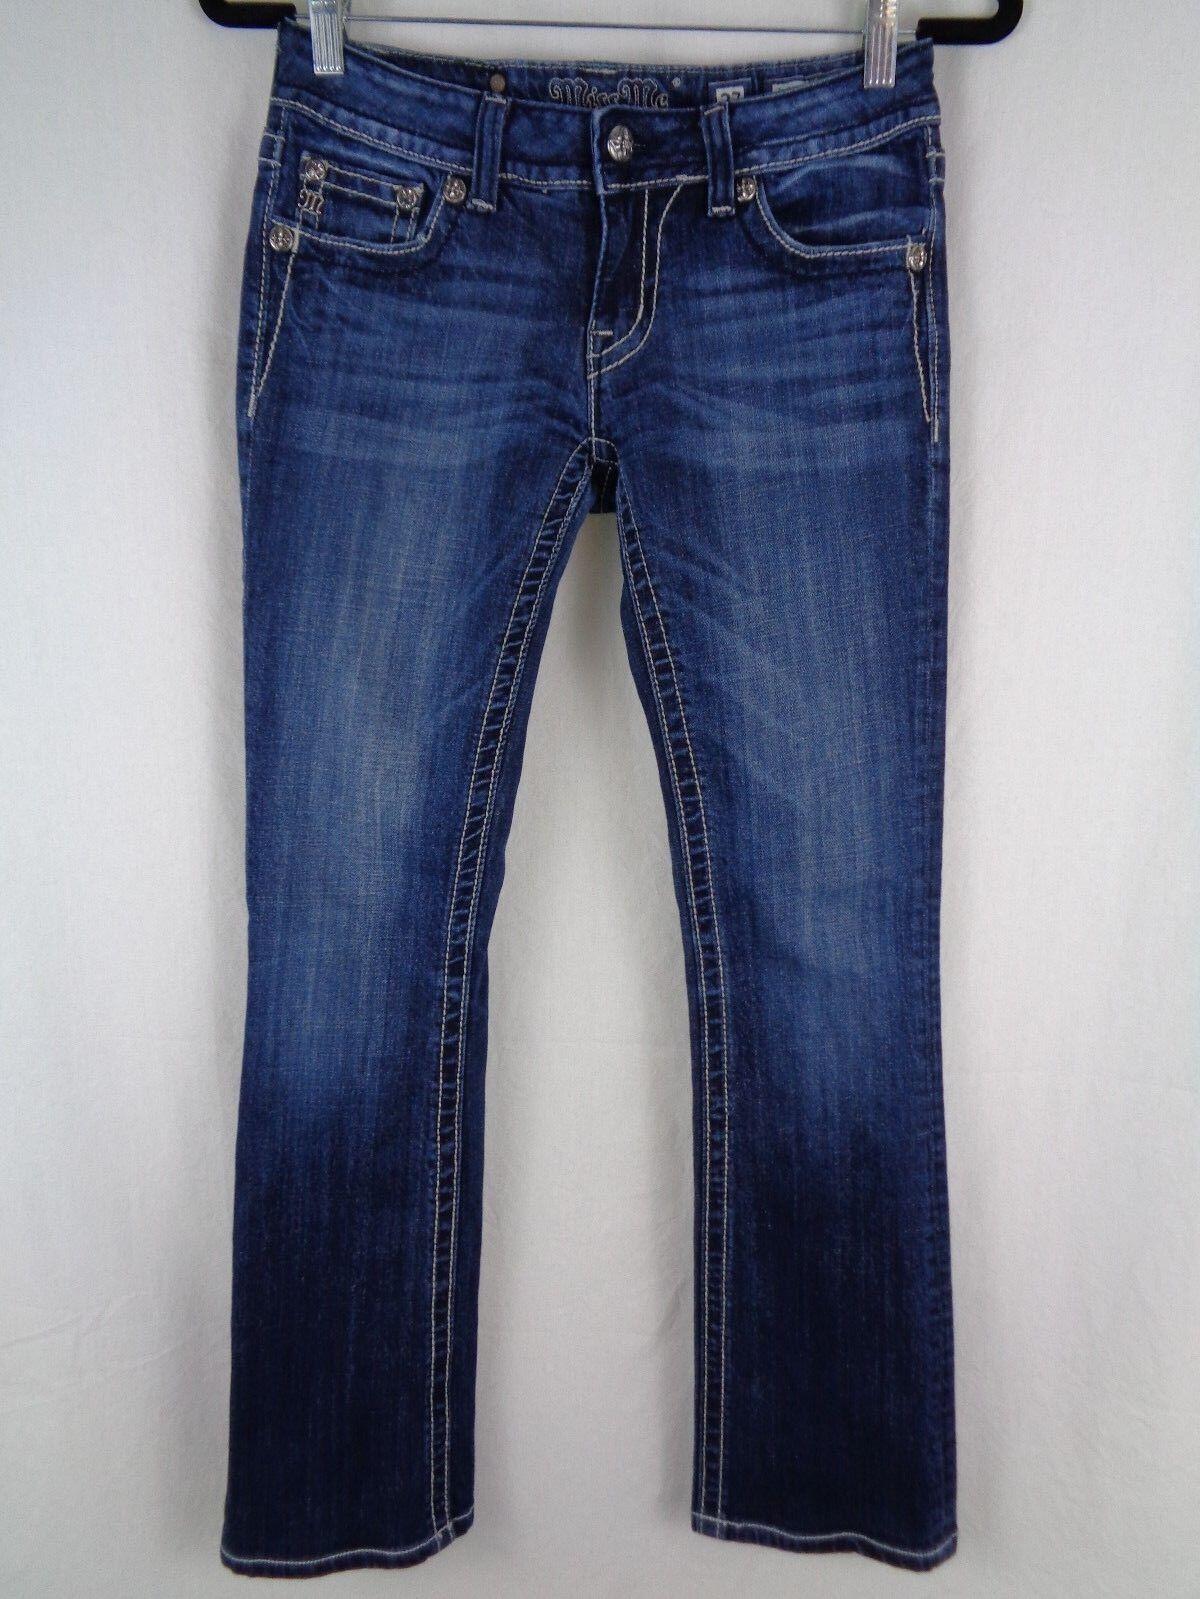 Miss Me Womens Jeans Size 27 bluee Pants 28X30